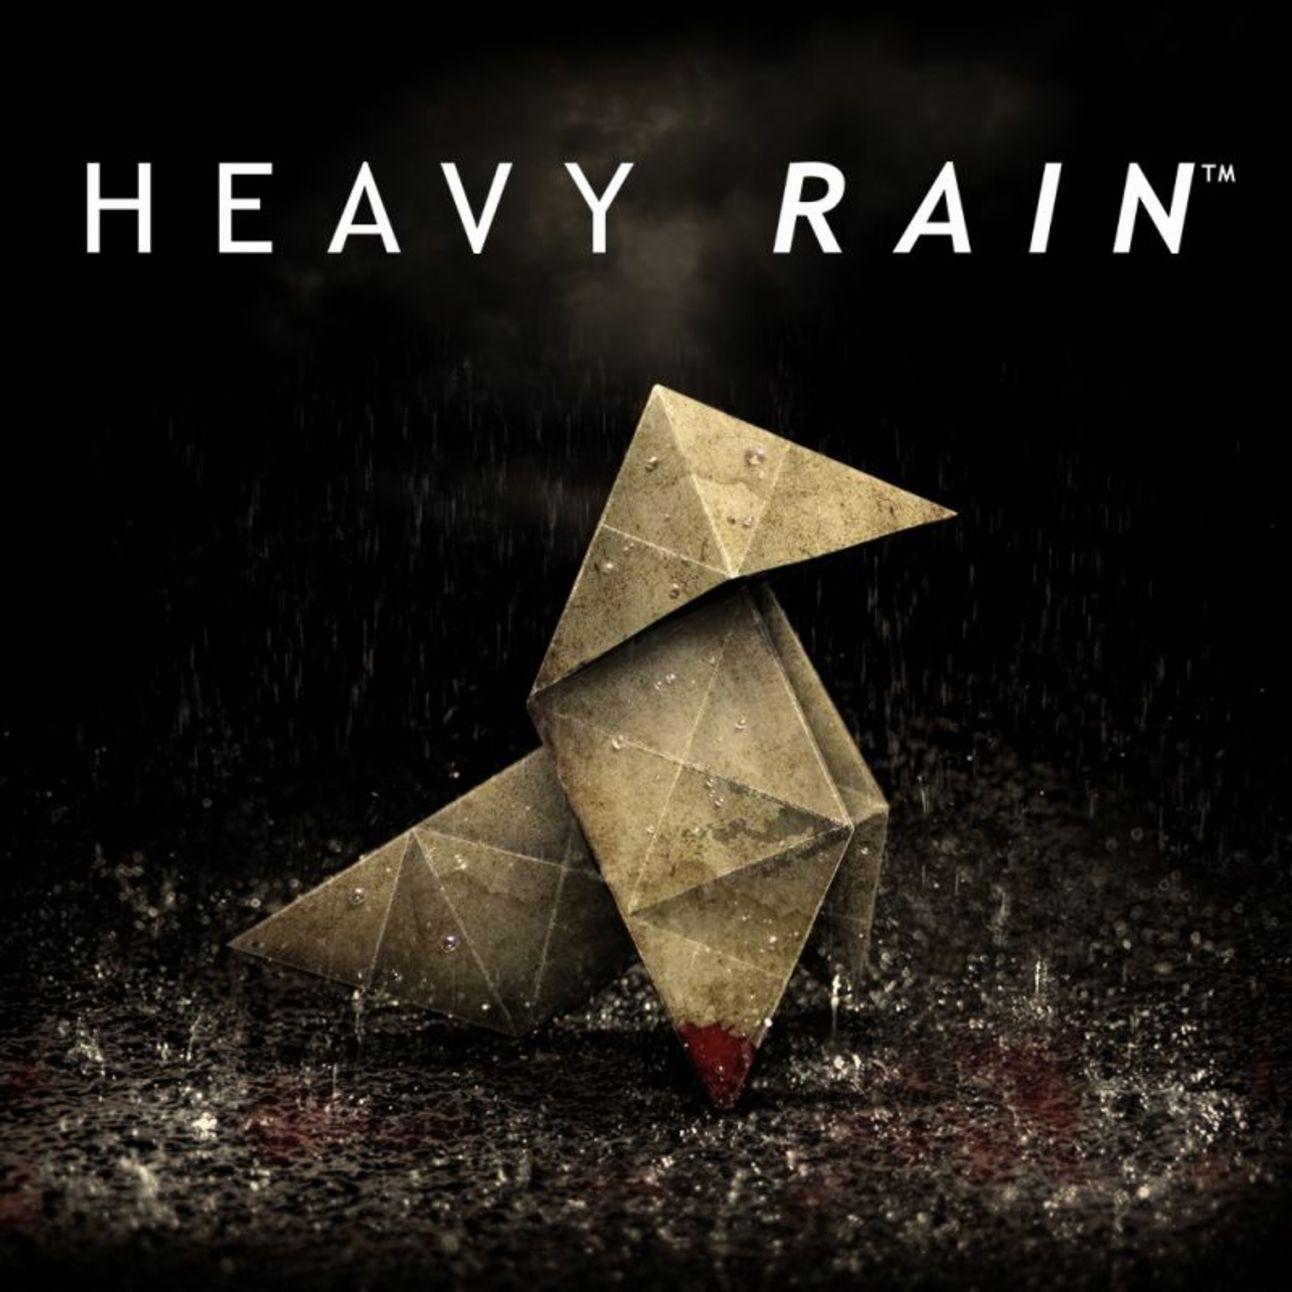 324784-heavy-rain-playstation-4-front-cover.jpg